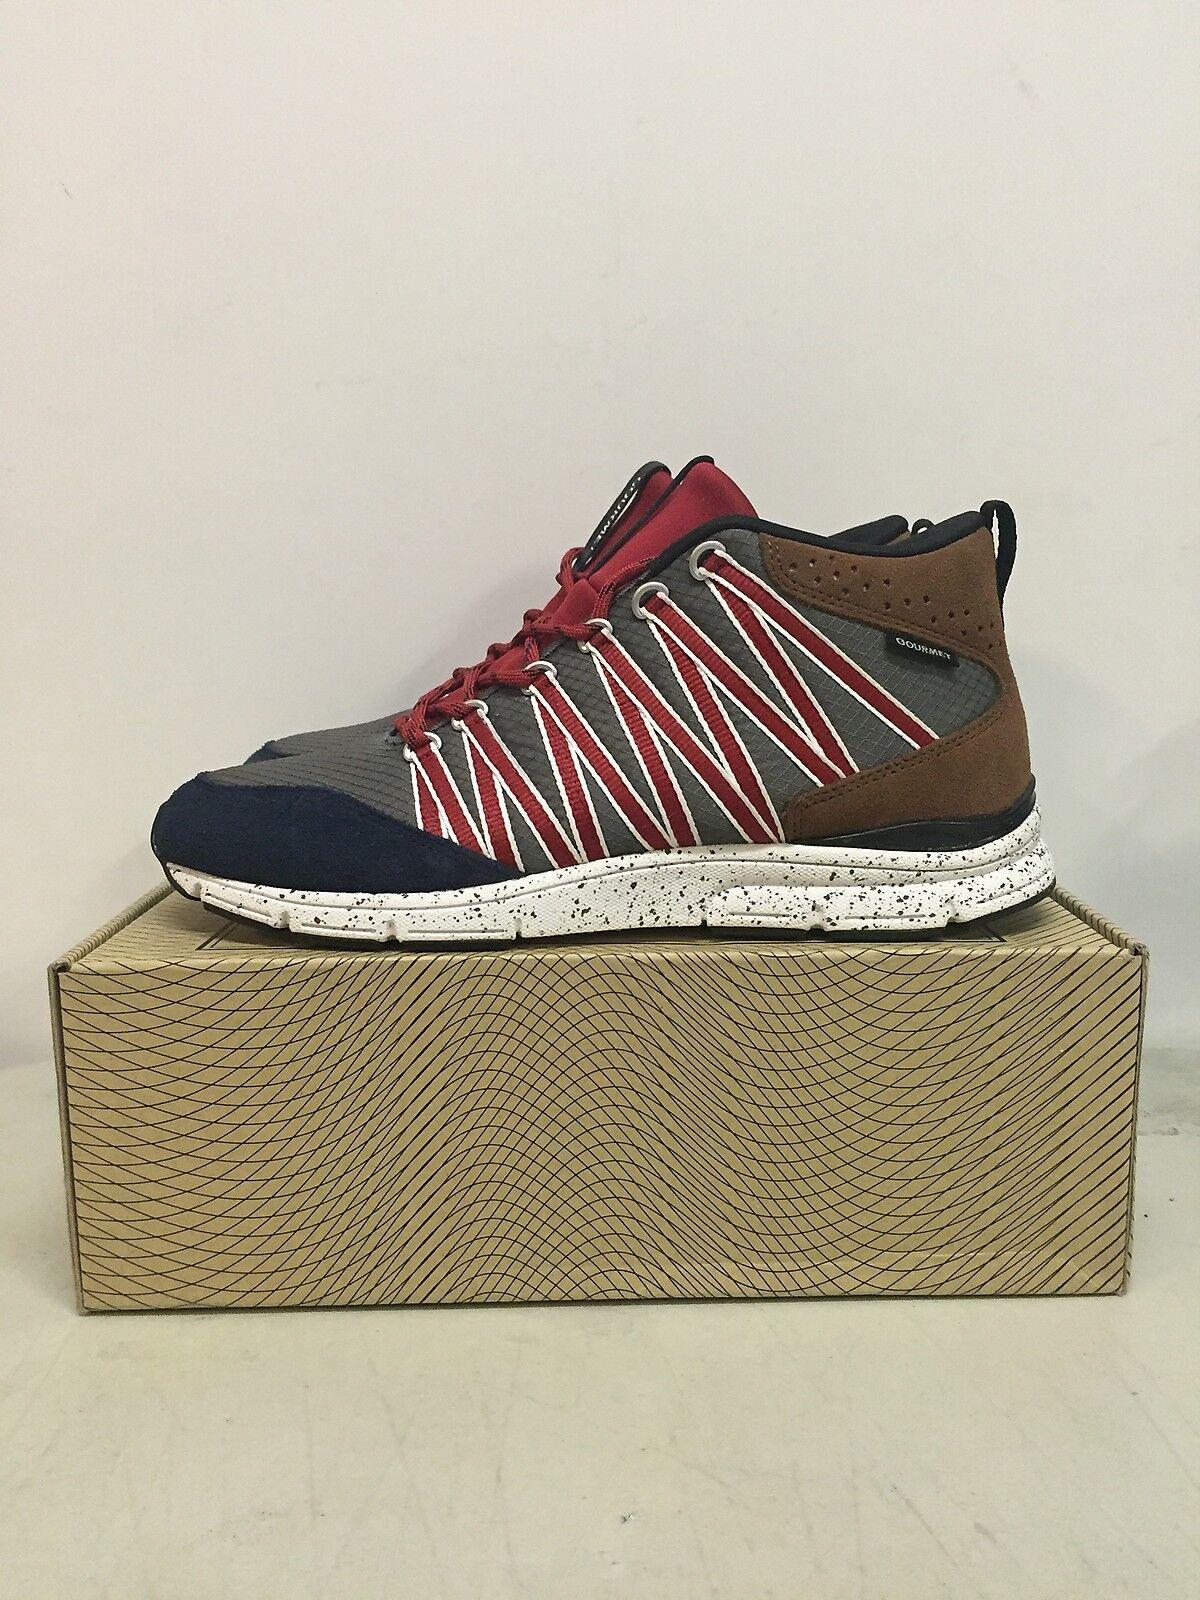 Gourmet Footwear Corridore Shoes Charcoal uomo Sneakers New 100322 CHAR/VGTN 8.5 Scarpe classiche da uomo